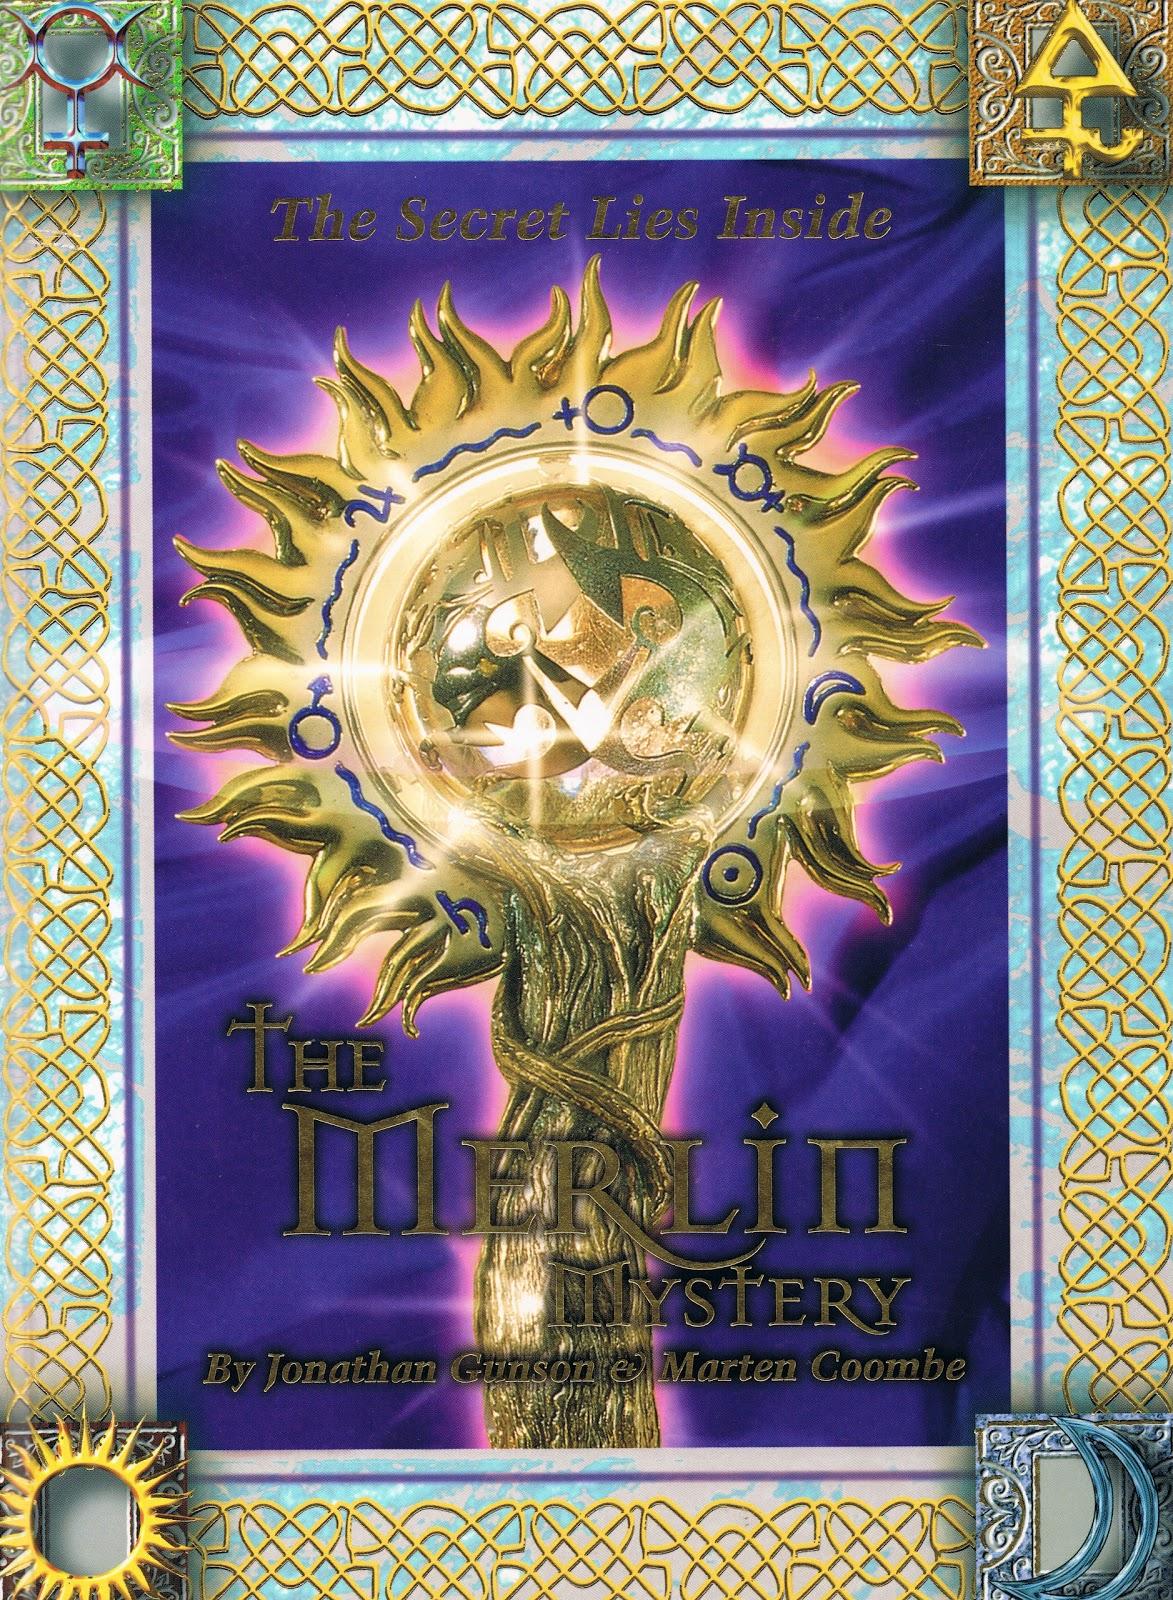 The Merlin Mystery Videos